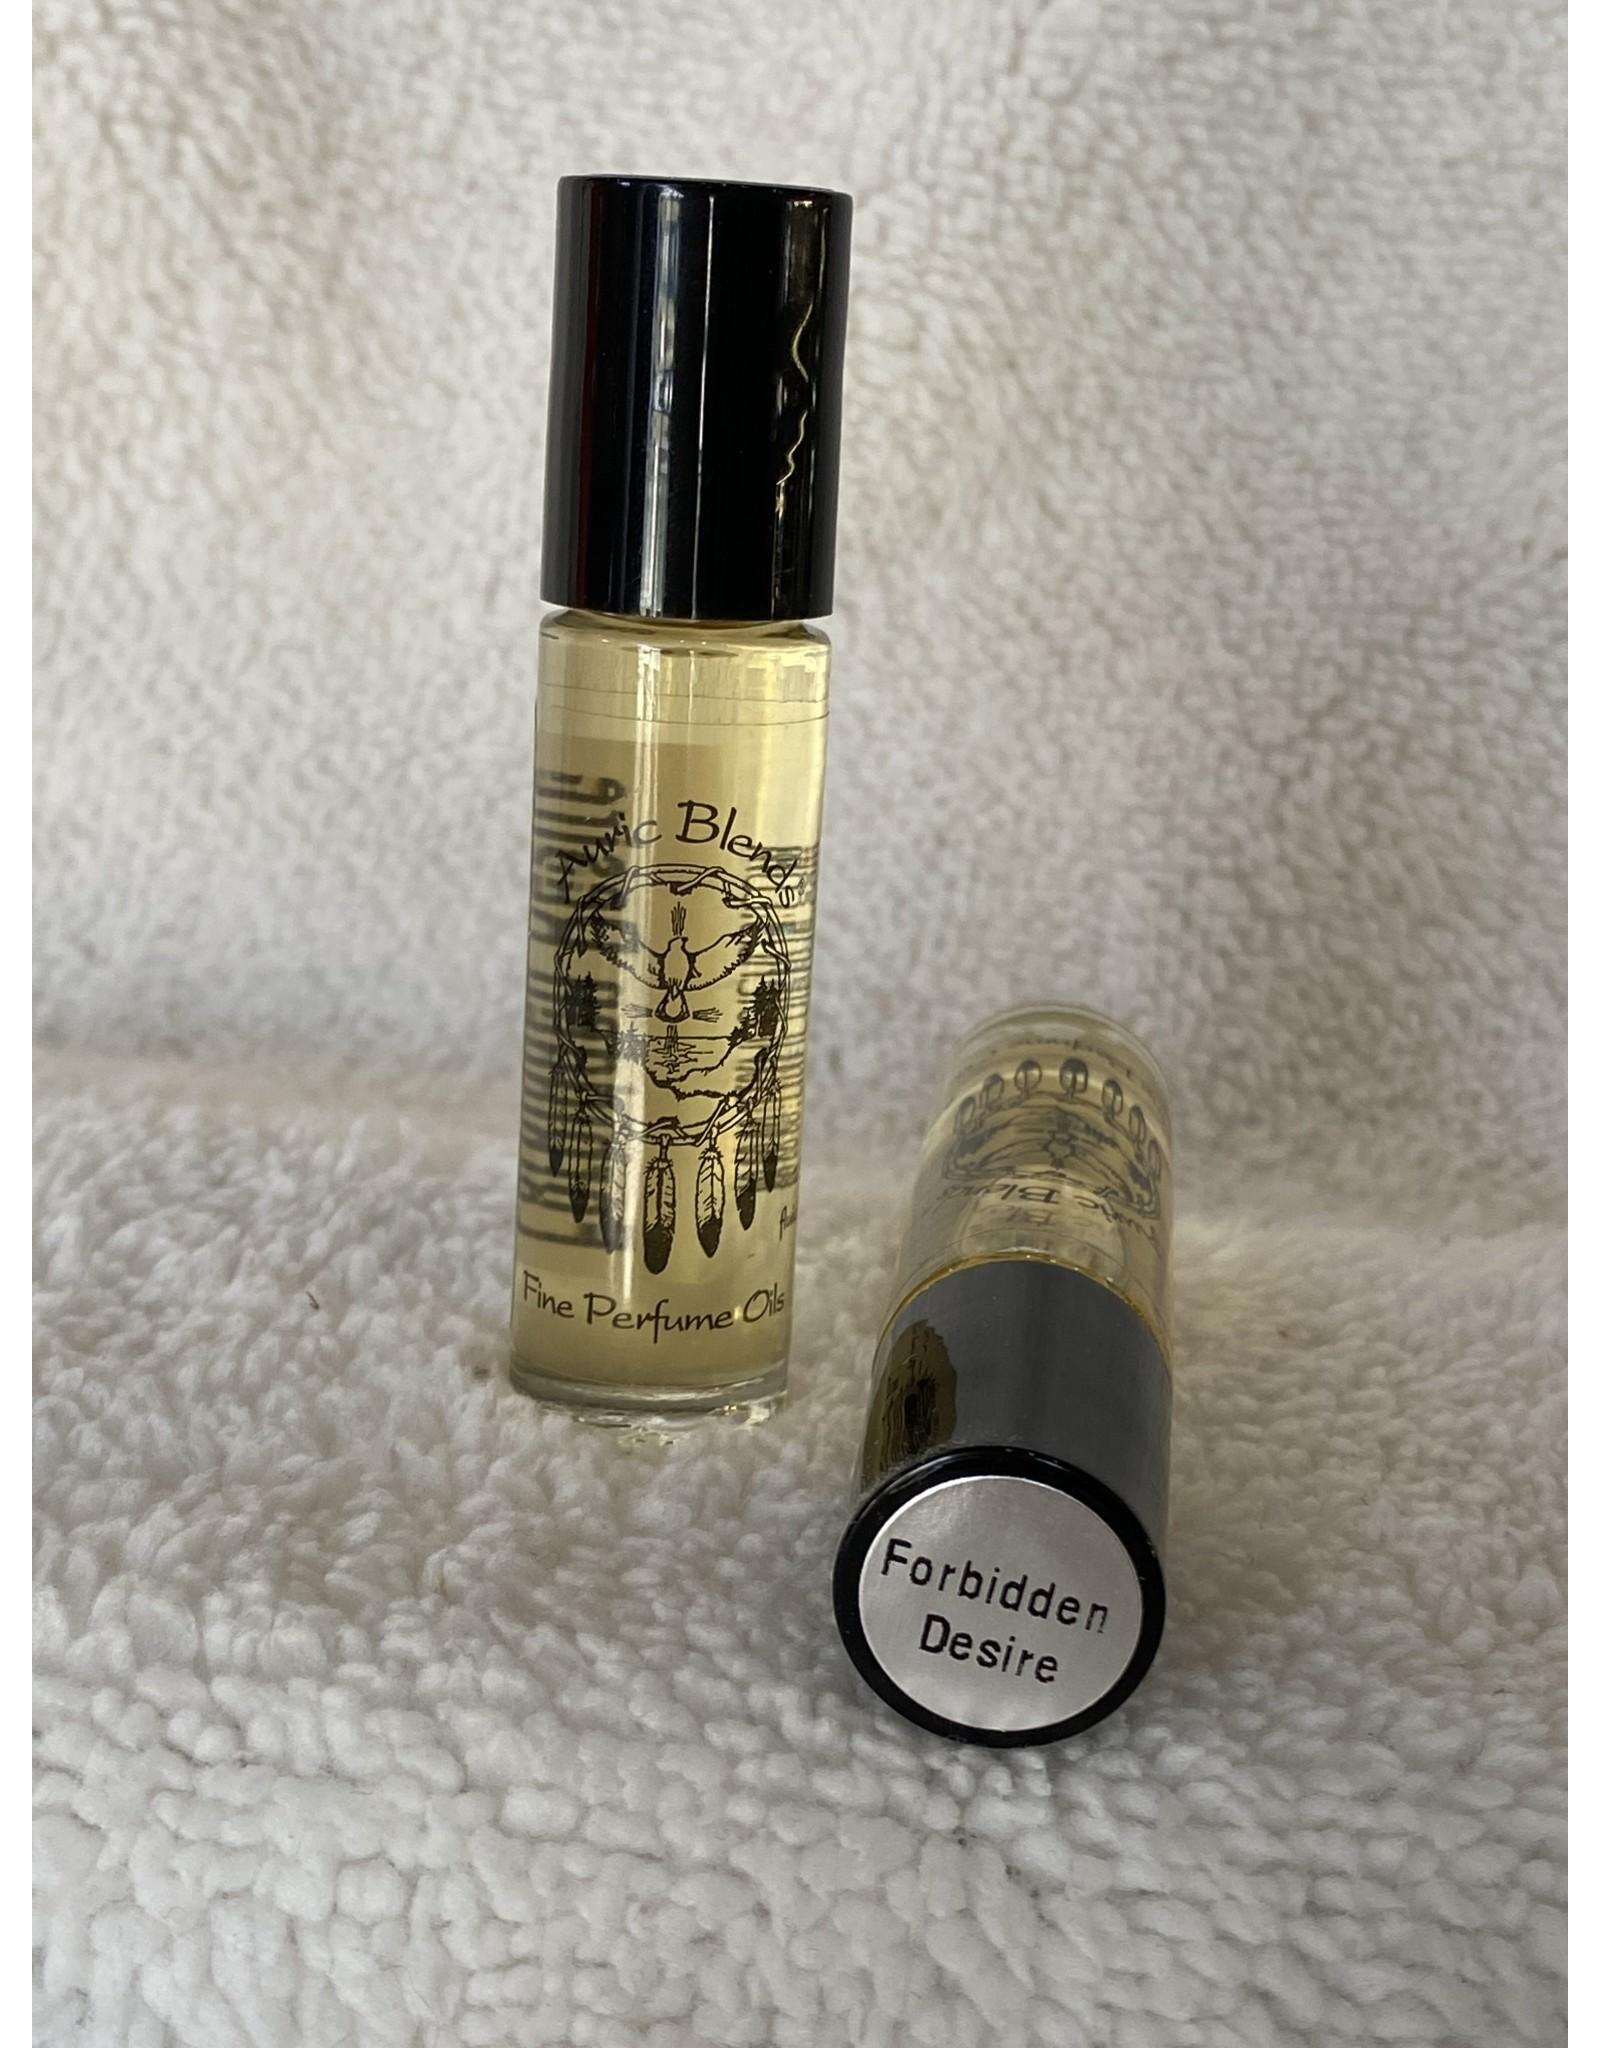 Auric Blends Perfume Roll-on | Forbidden Desire